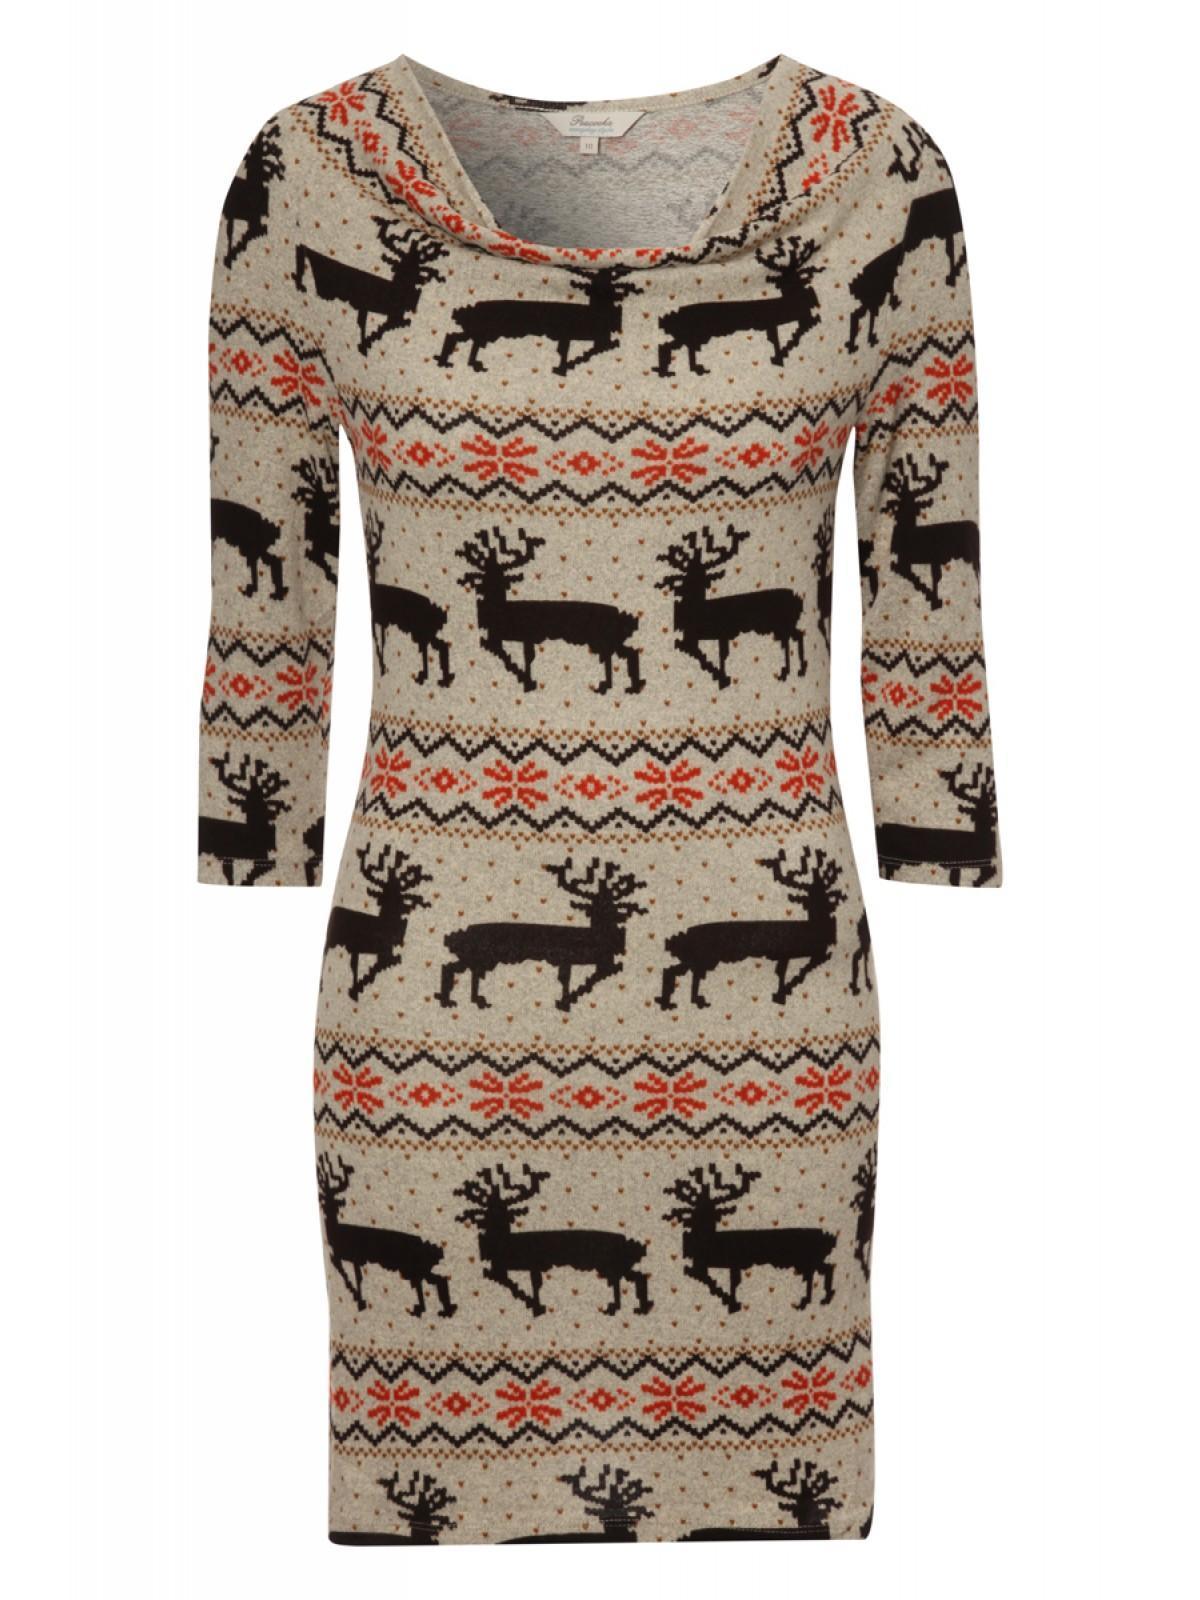 Womens Cowl Neck Sweater Dress   Peacocks